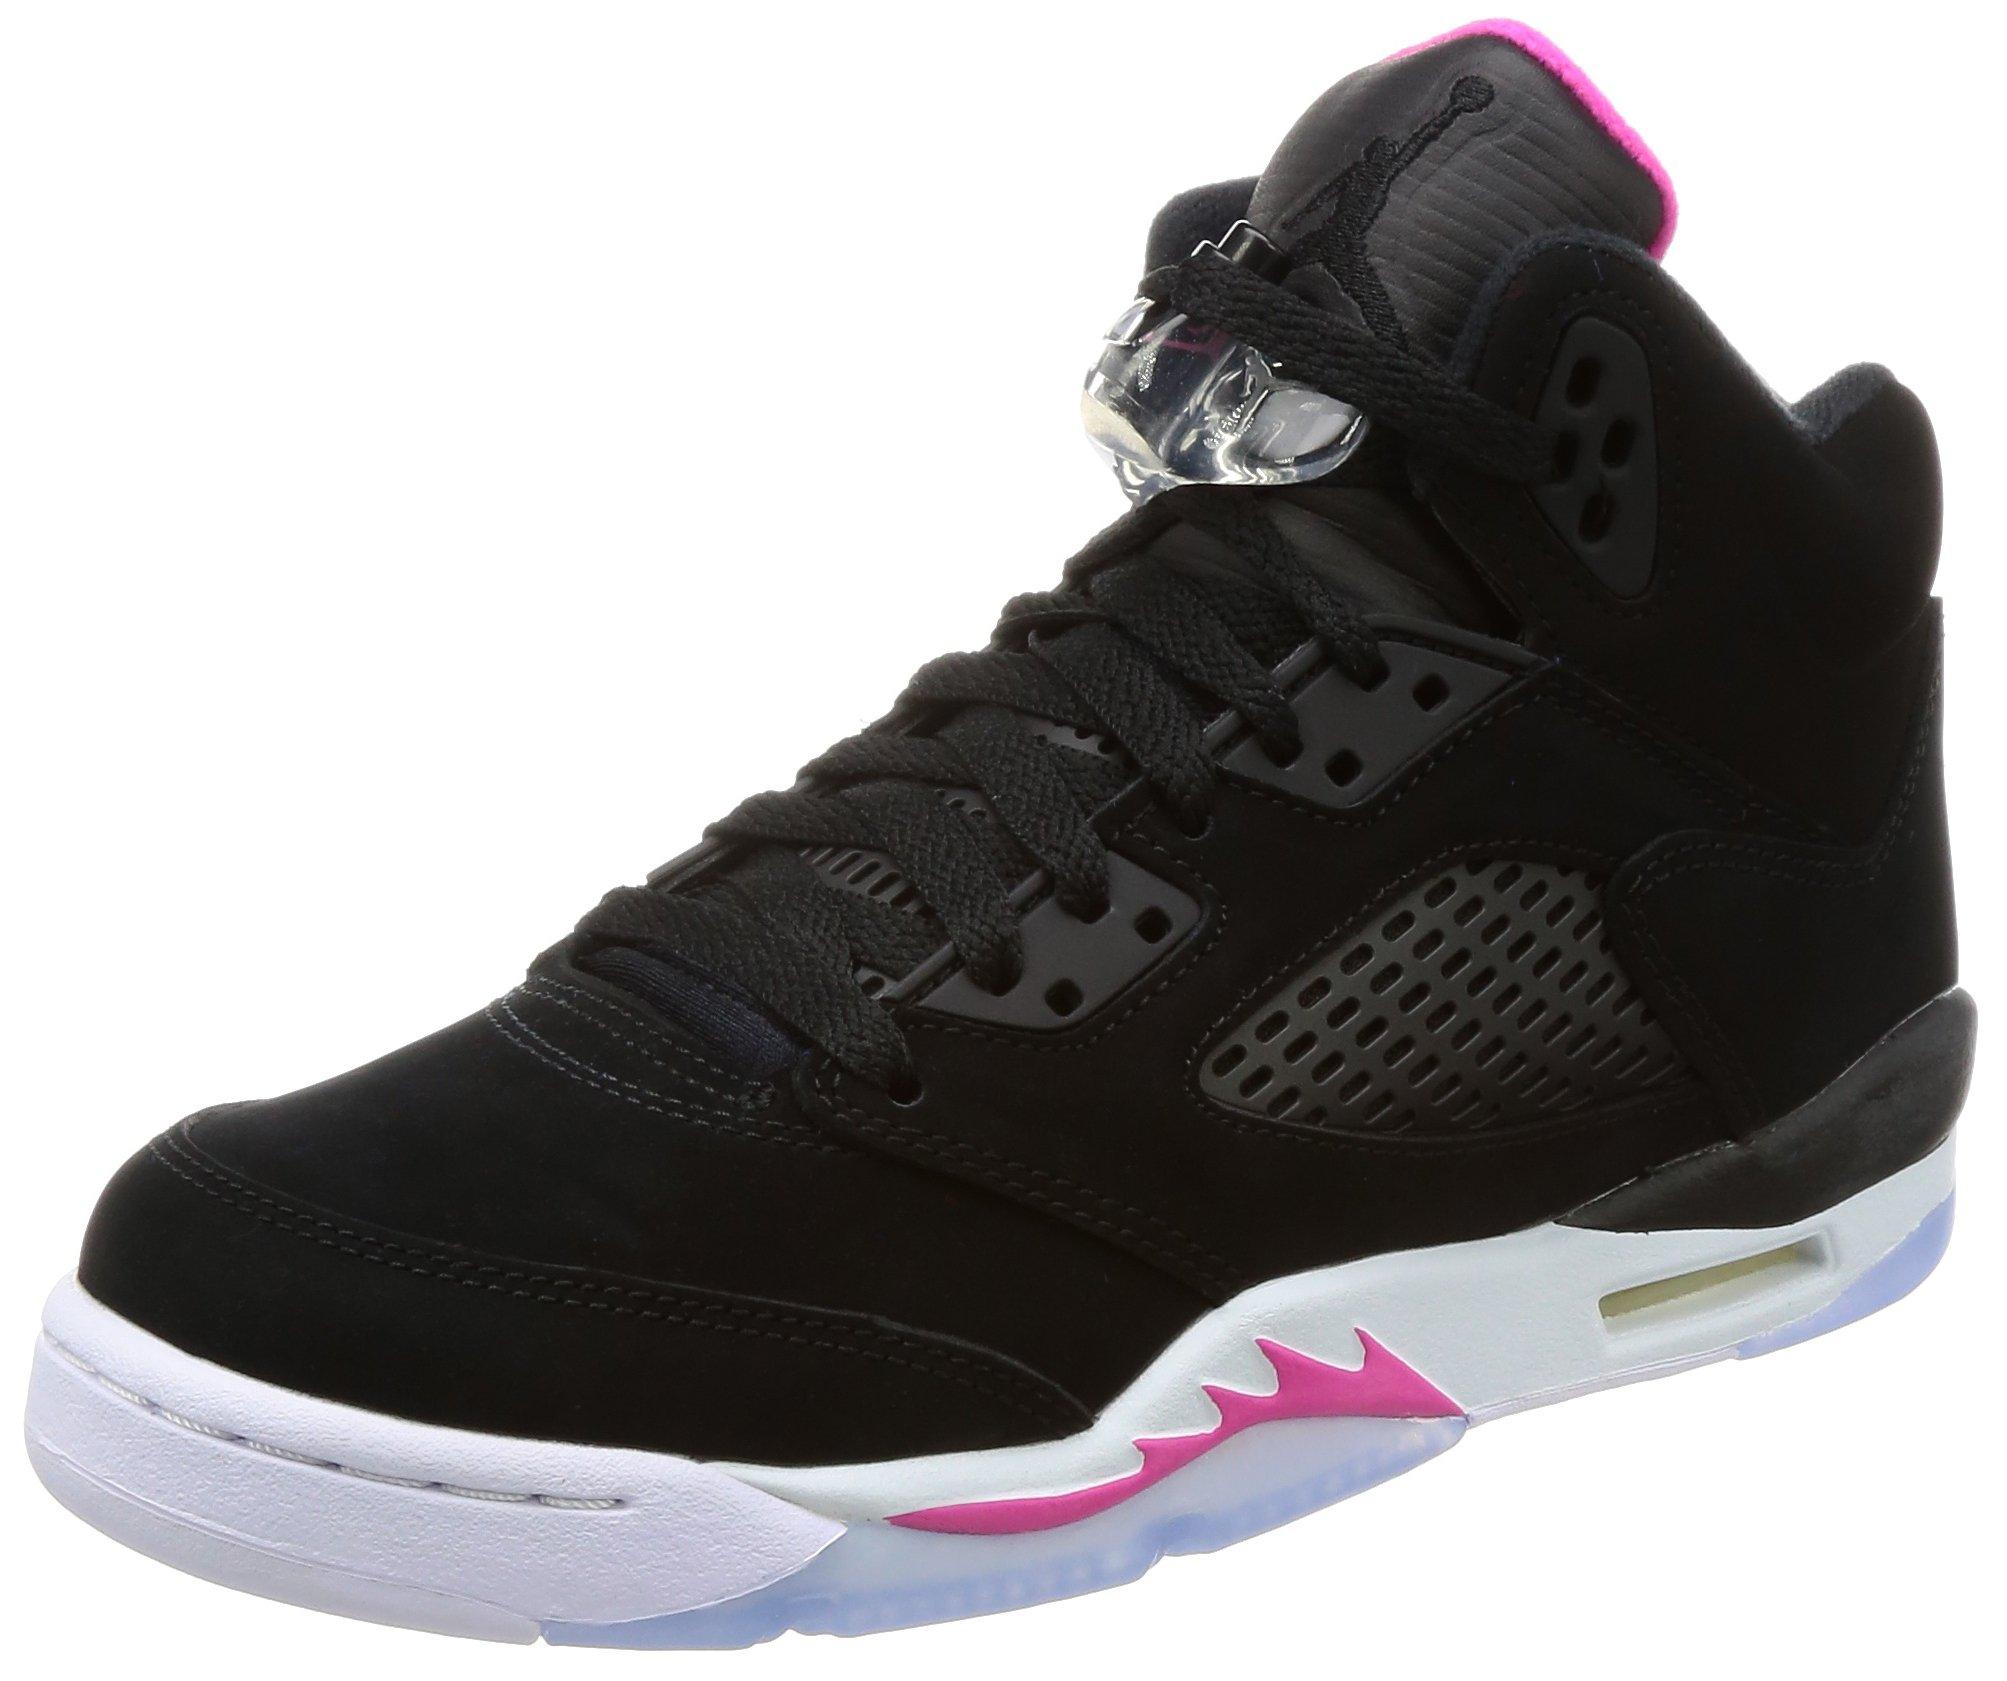 Jordan Nike Kids Air 5 Retro GG Black/Black Deadly Pink White Basketball Shoe 7 Kids US